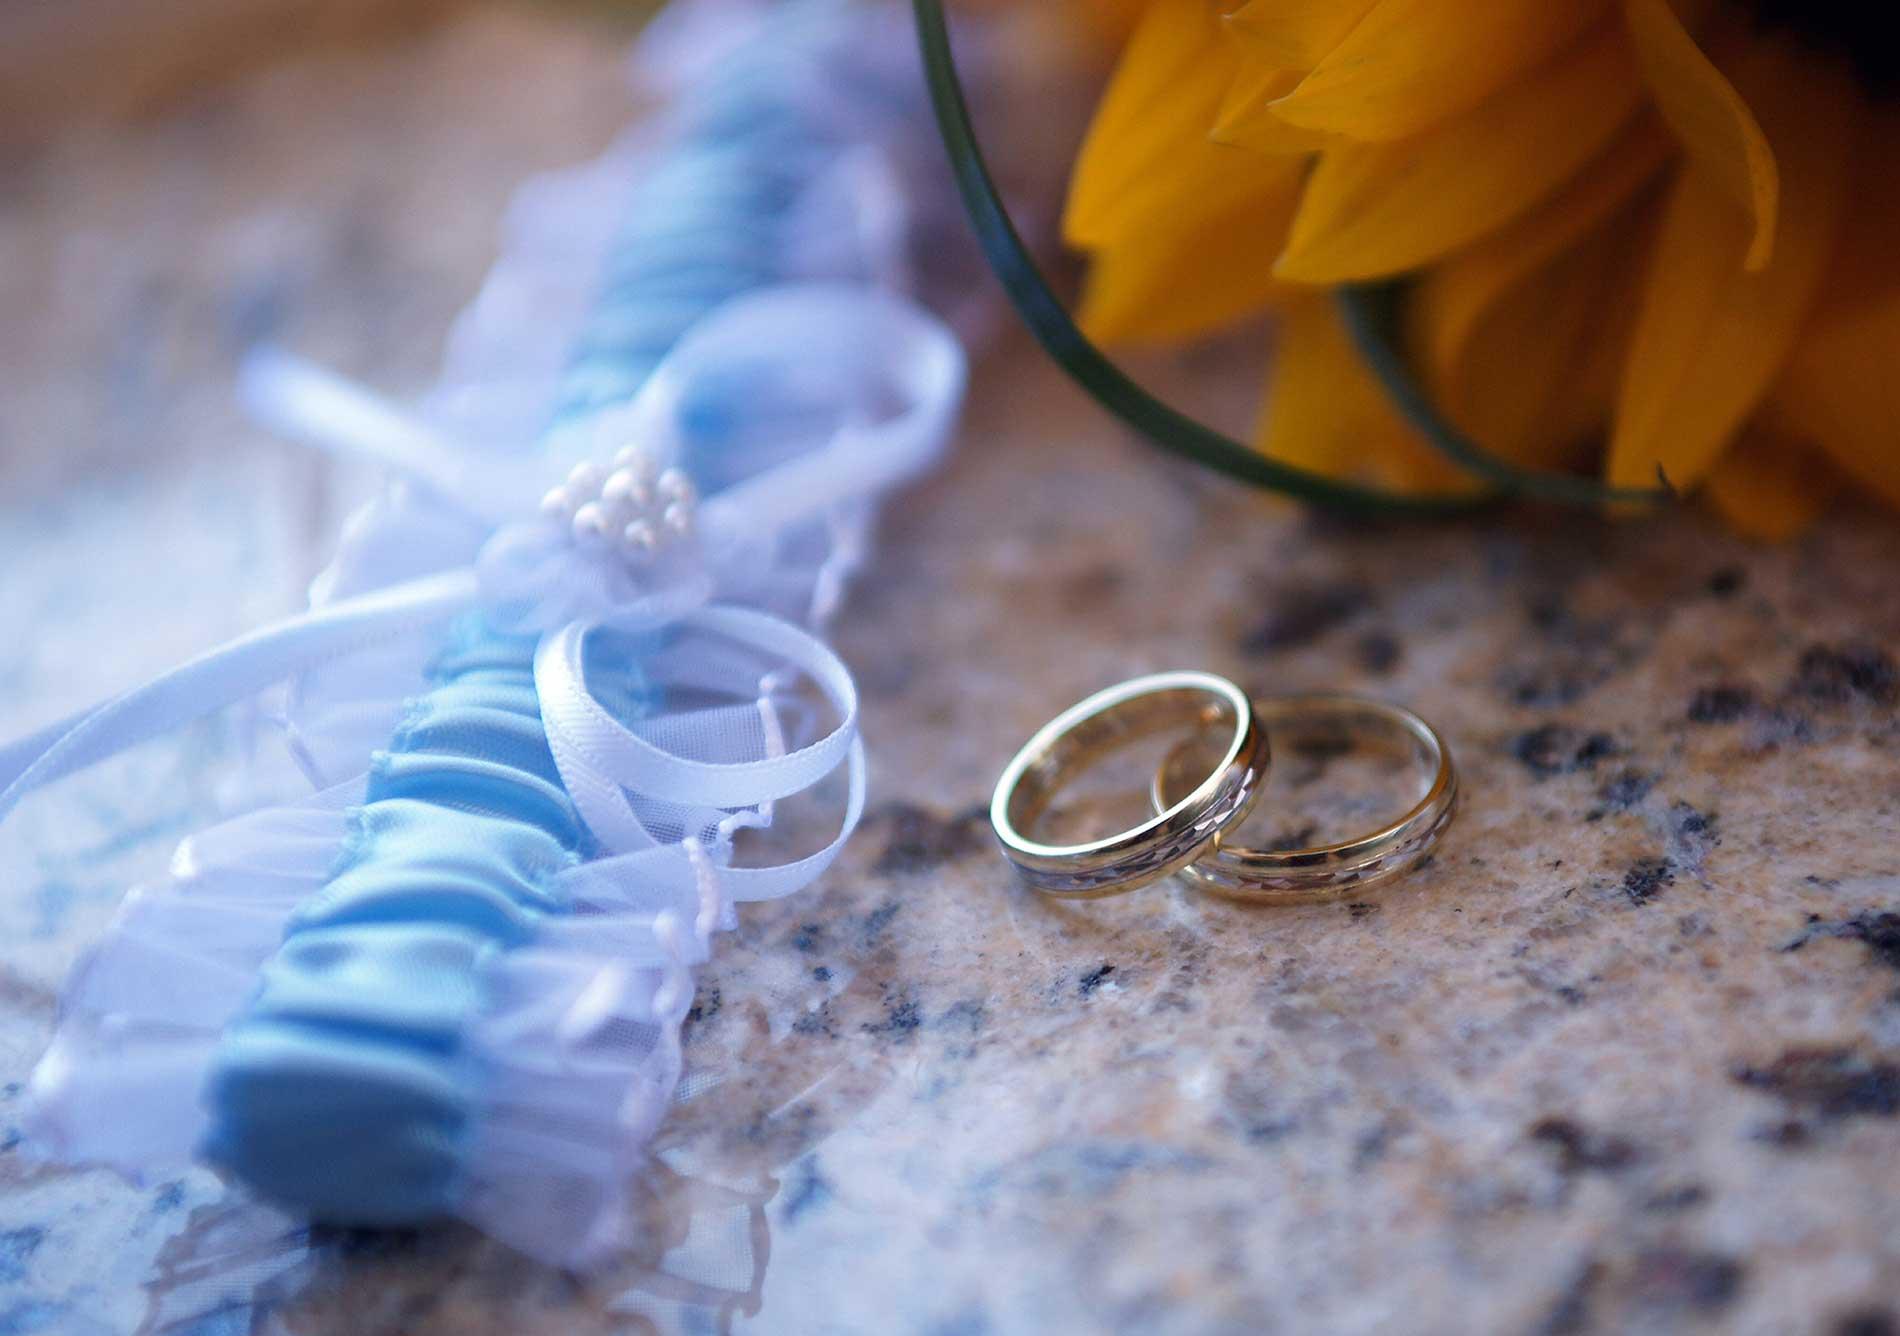 37 svatebni fotografie hluboka nad vltavou cesky krumlov zlata koruna trebon ceske budejovice jihocesky kraj jizni cechy svatebni fotograf lipno nad vltavou potret tehotenske foto svatby 1